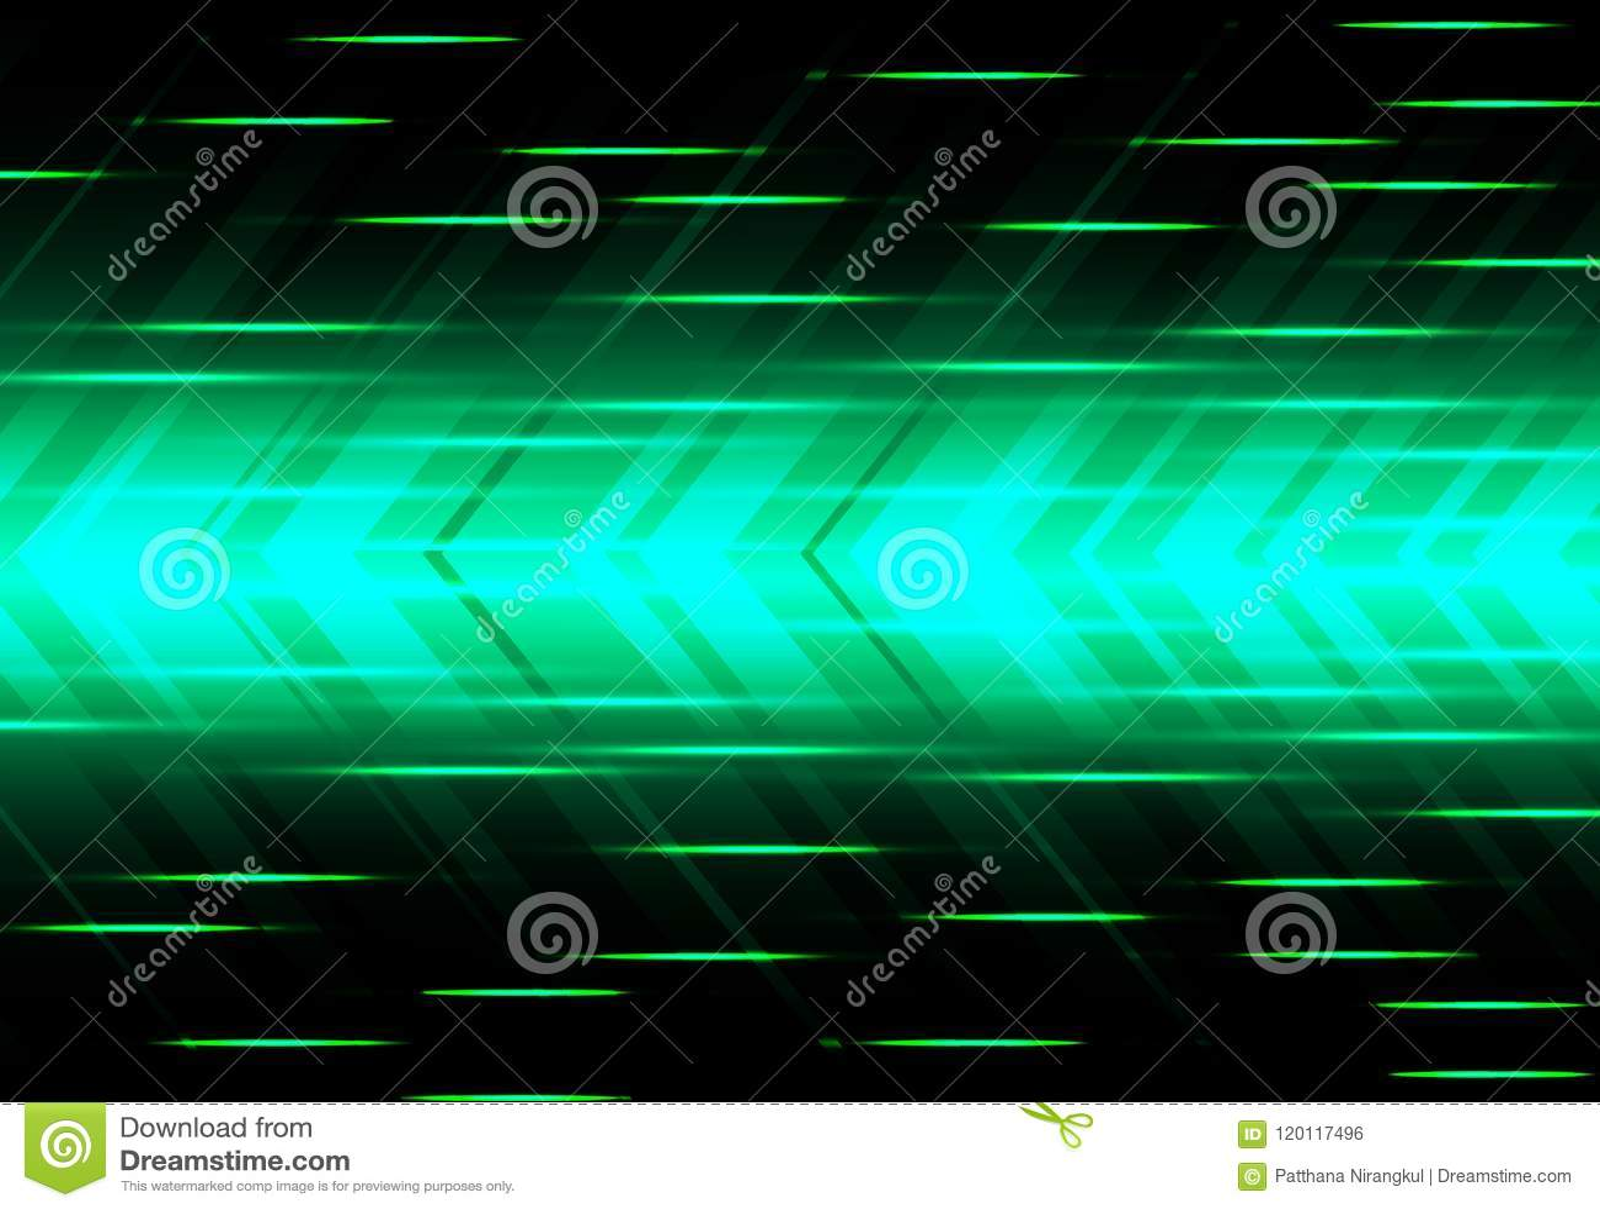 Abstract green arrow speed power technology futuristic modern background vector